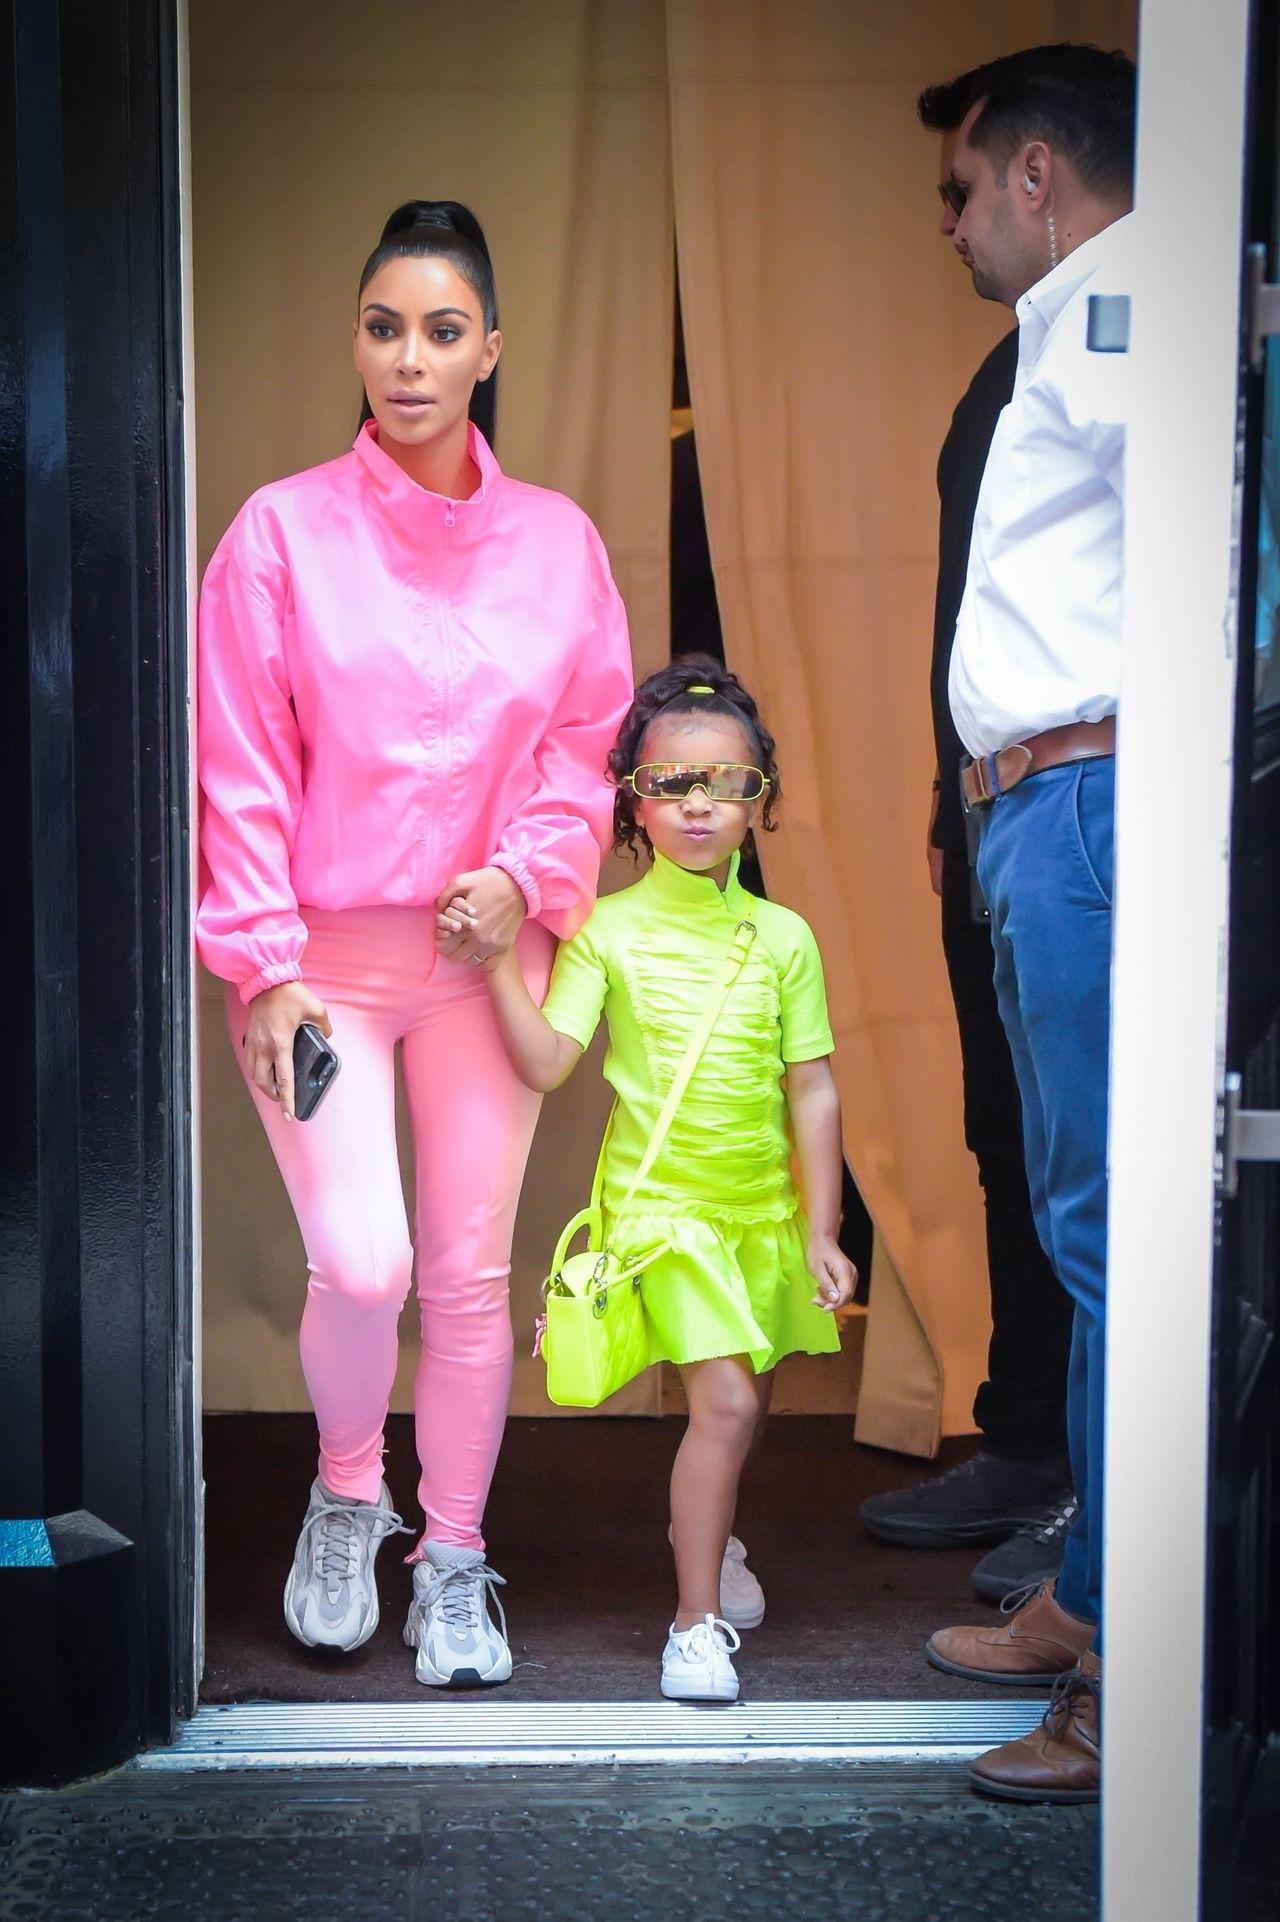 Kim Kardashian steps out with her kids before Kanye West's performance on SNL Kim Kardashian